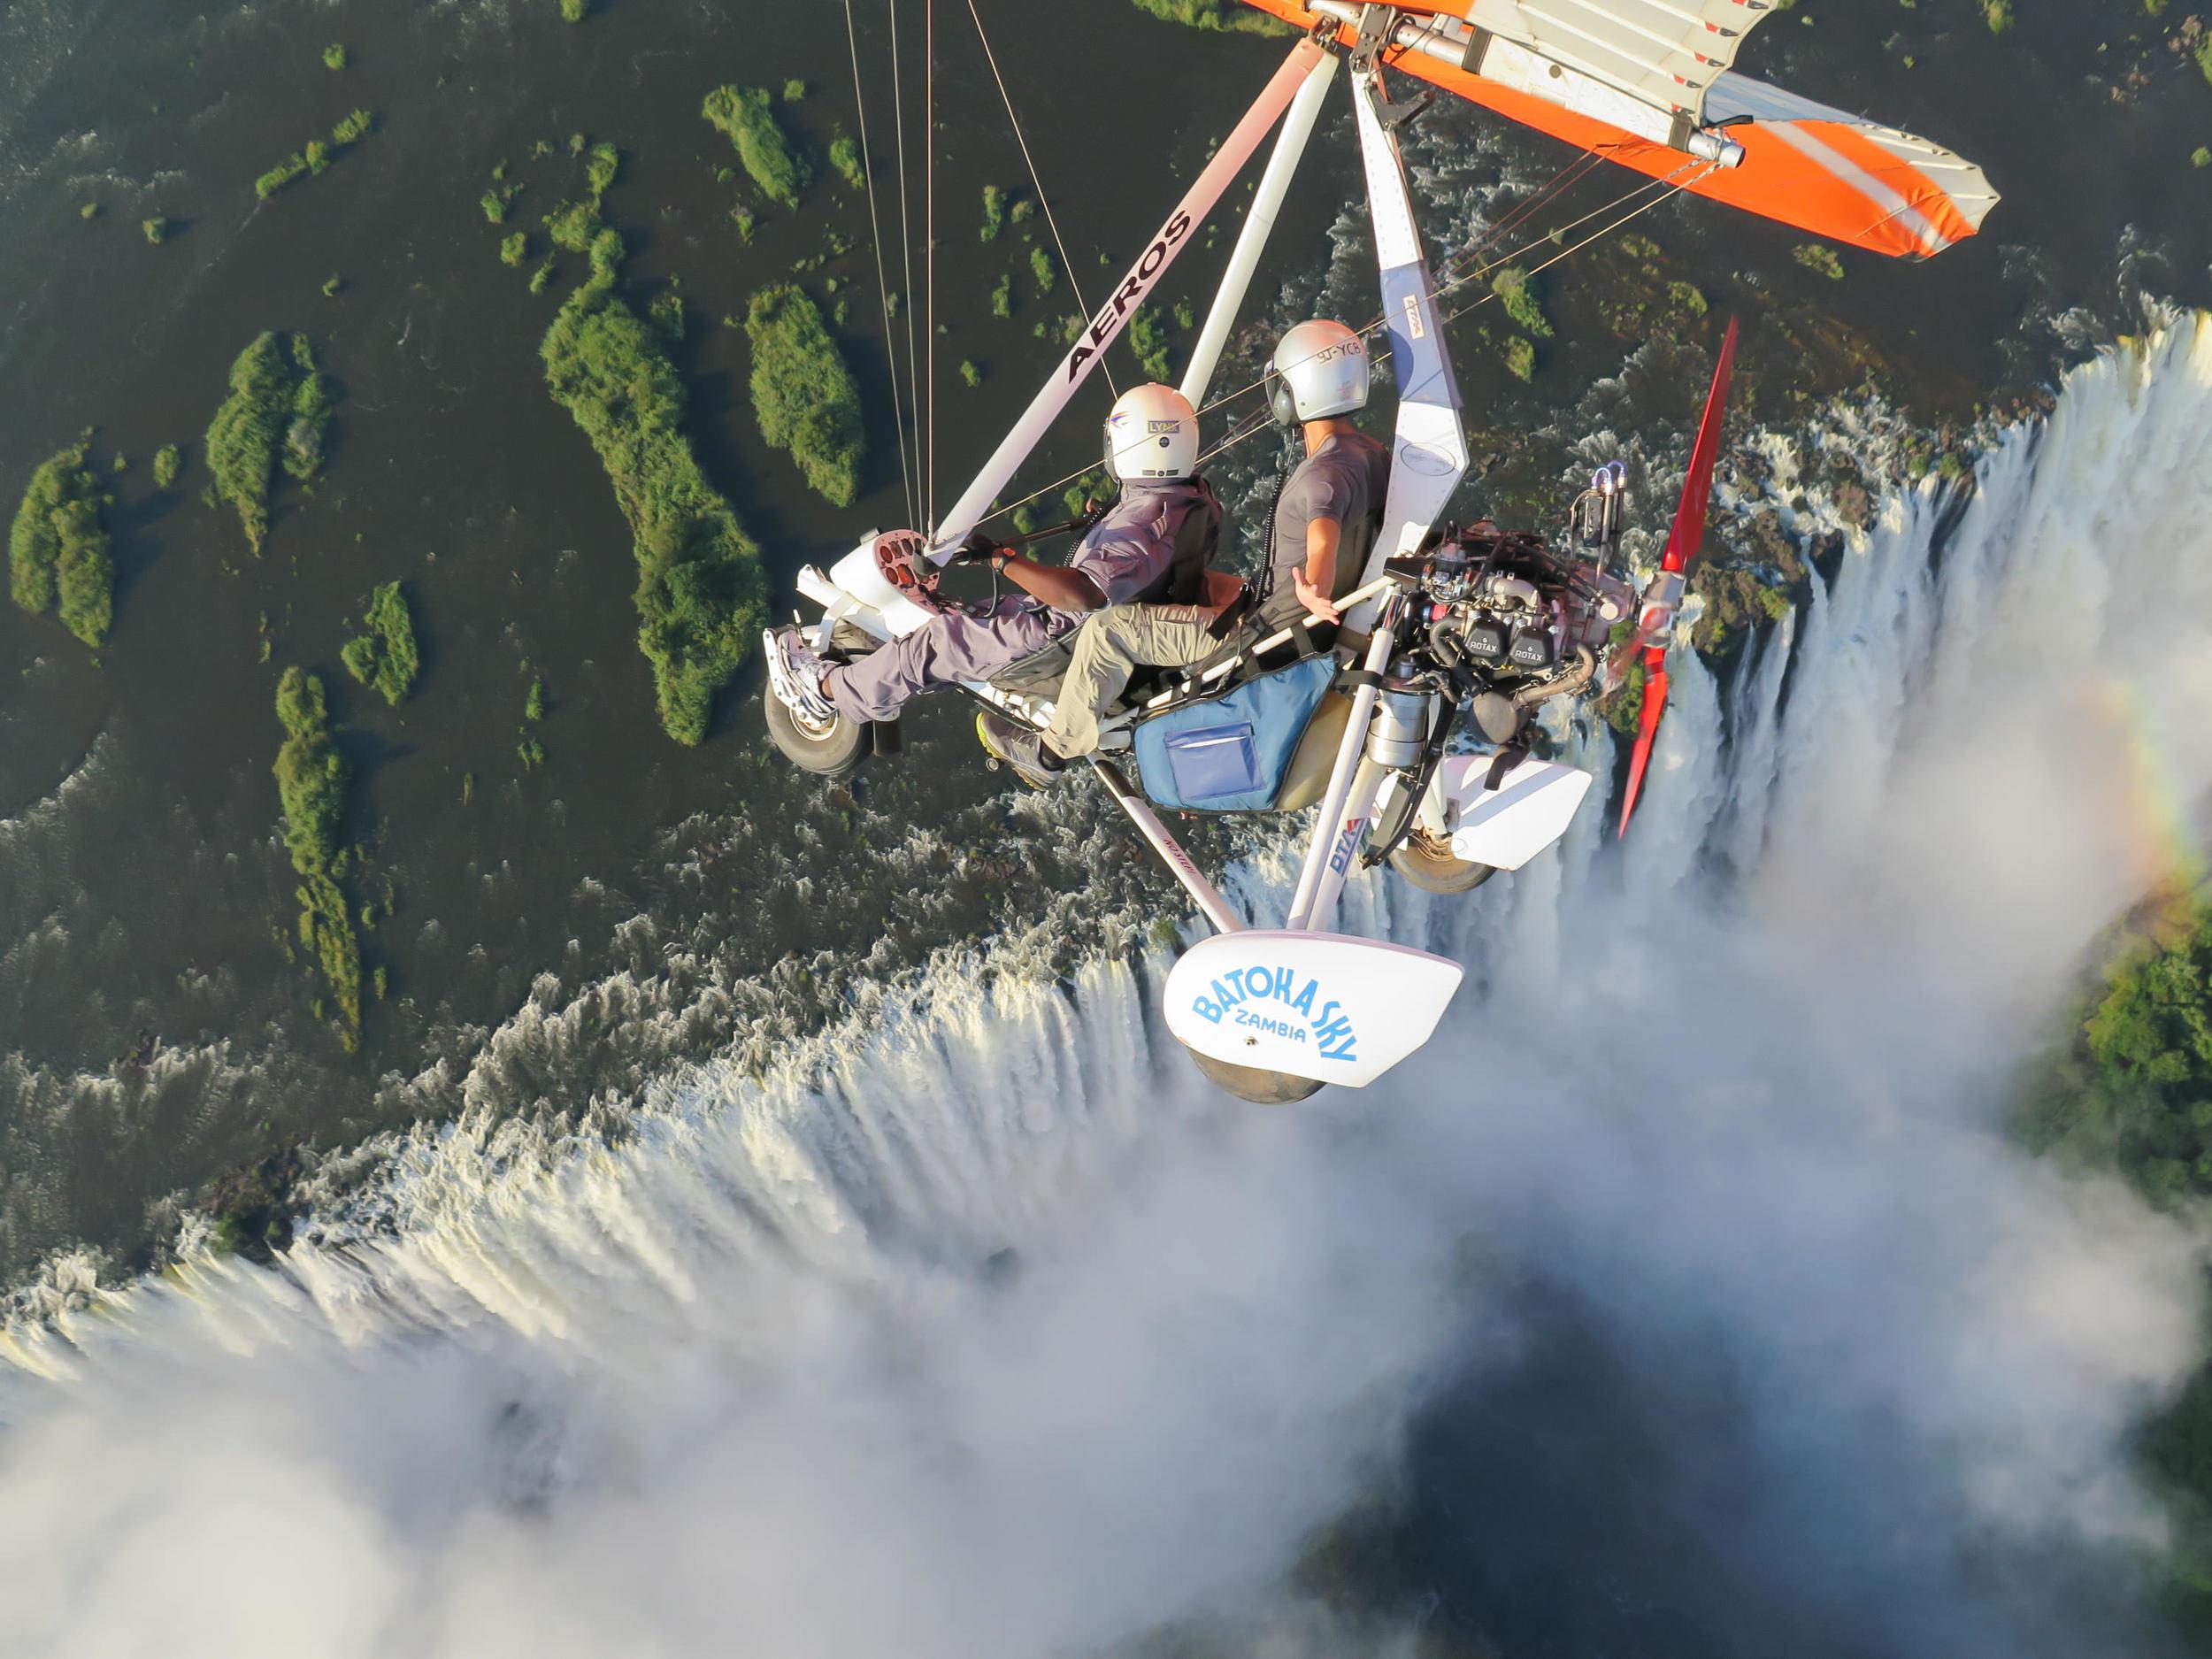 Microlight Flight over Victoria Falls